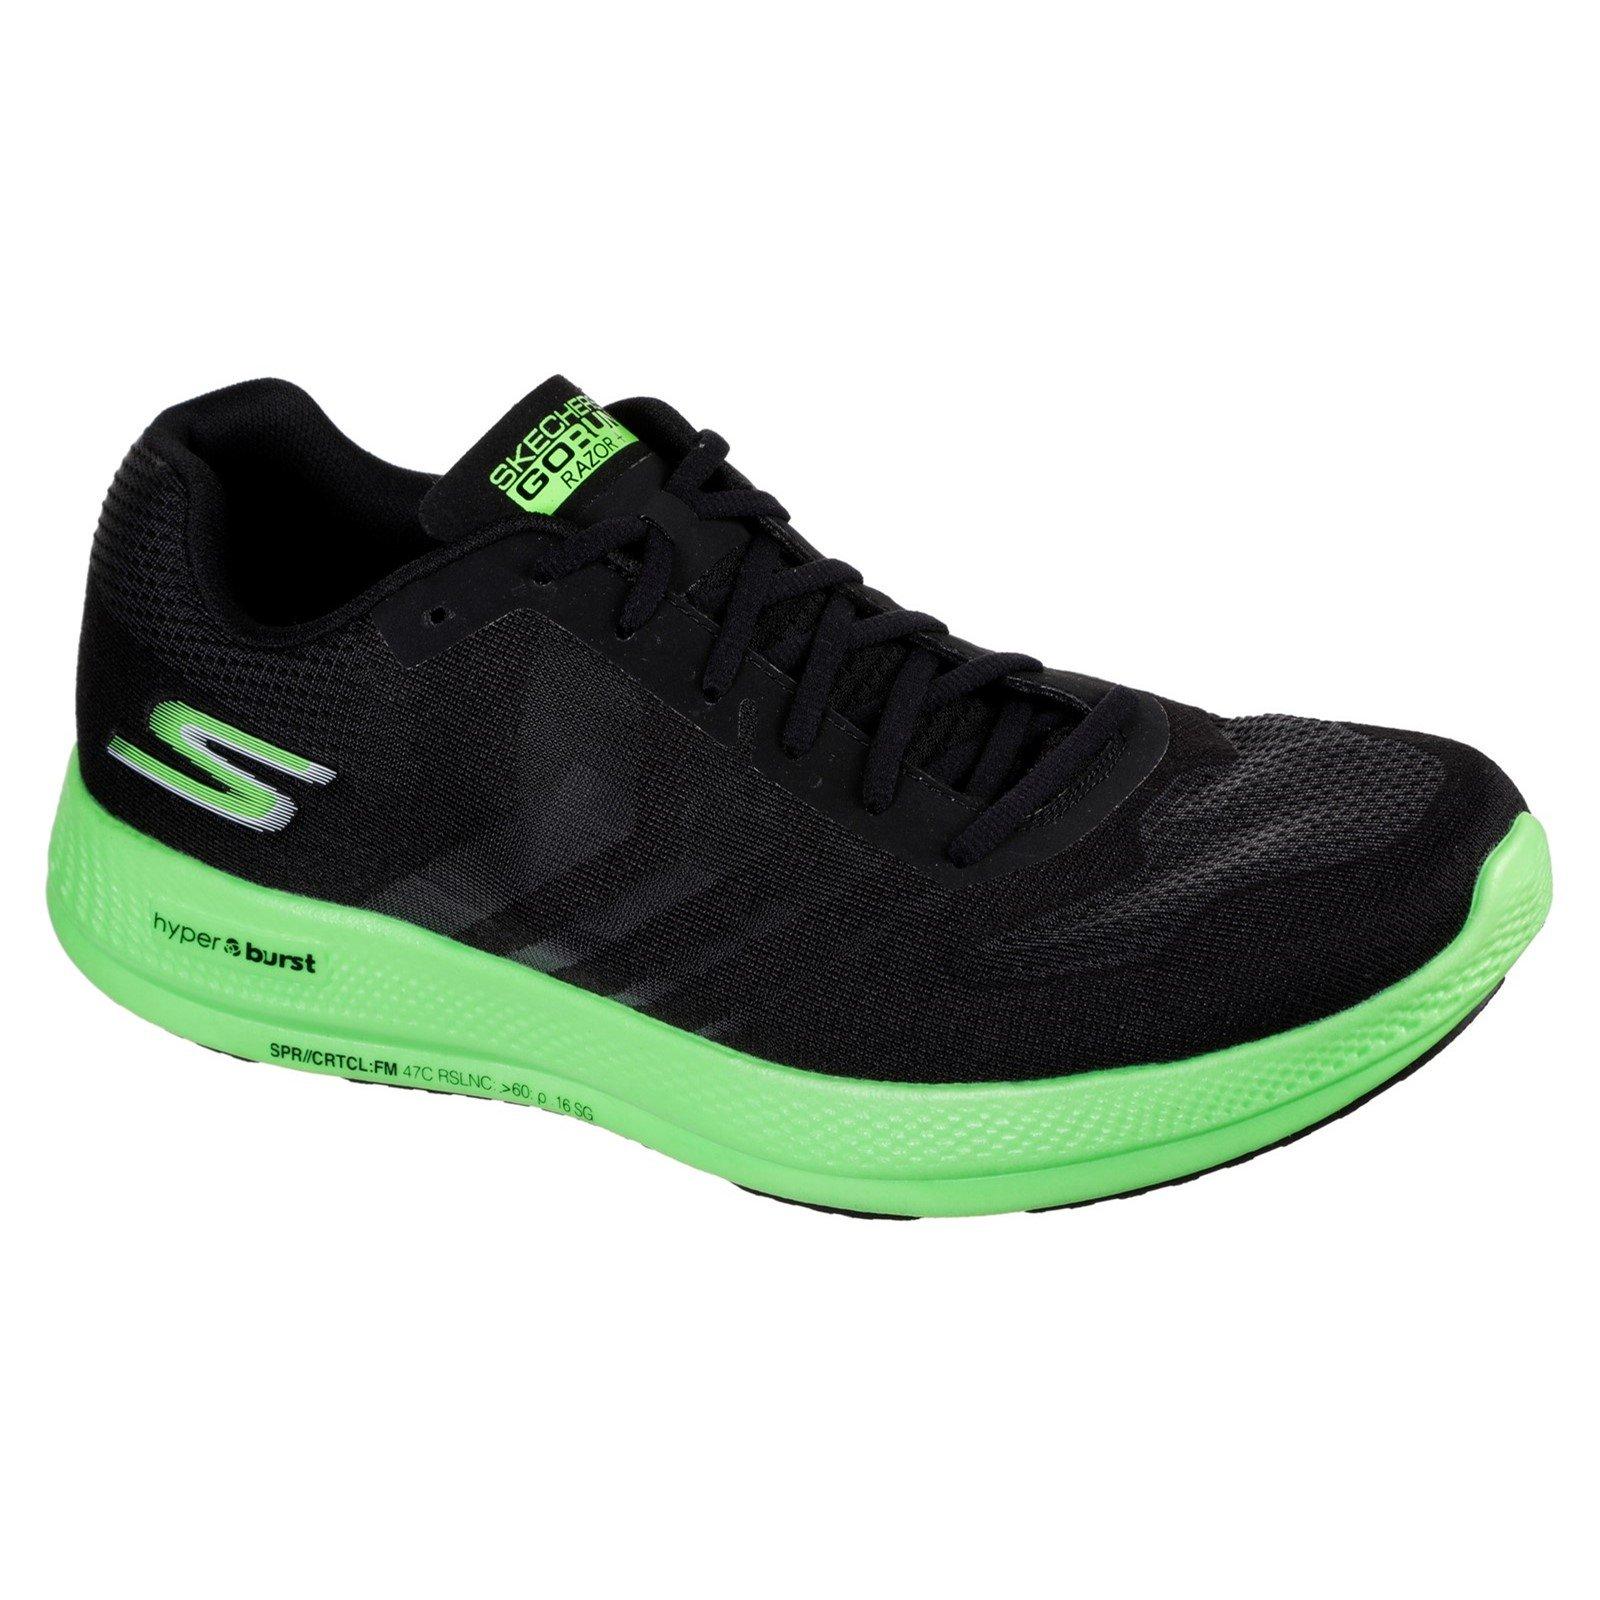 Skechers Men's Go Run Razor Trainer Multicolor 32699 - Black/Green 11